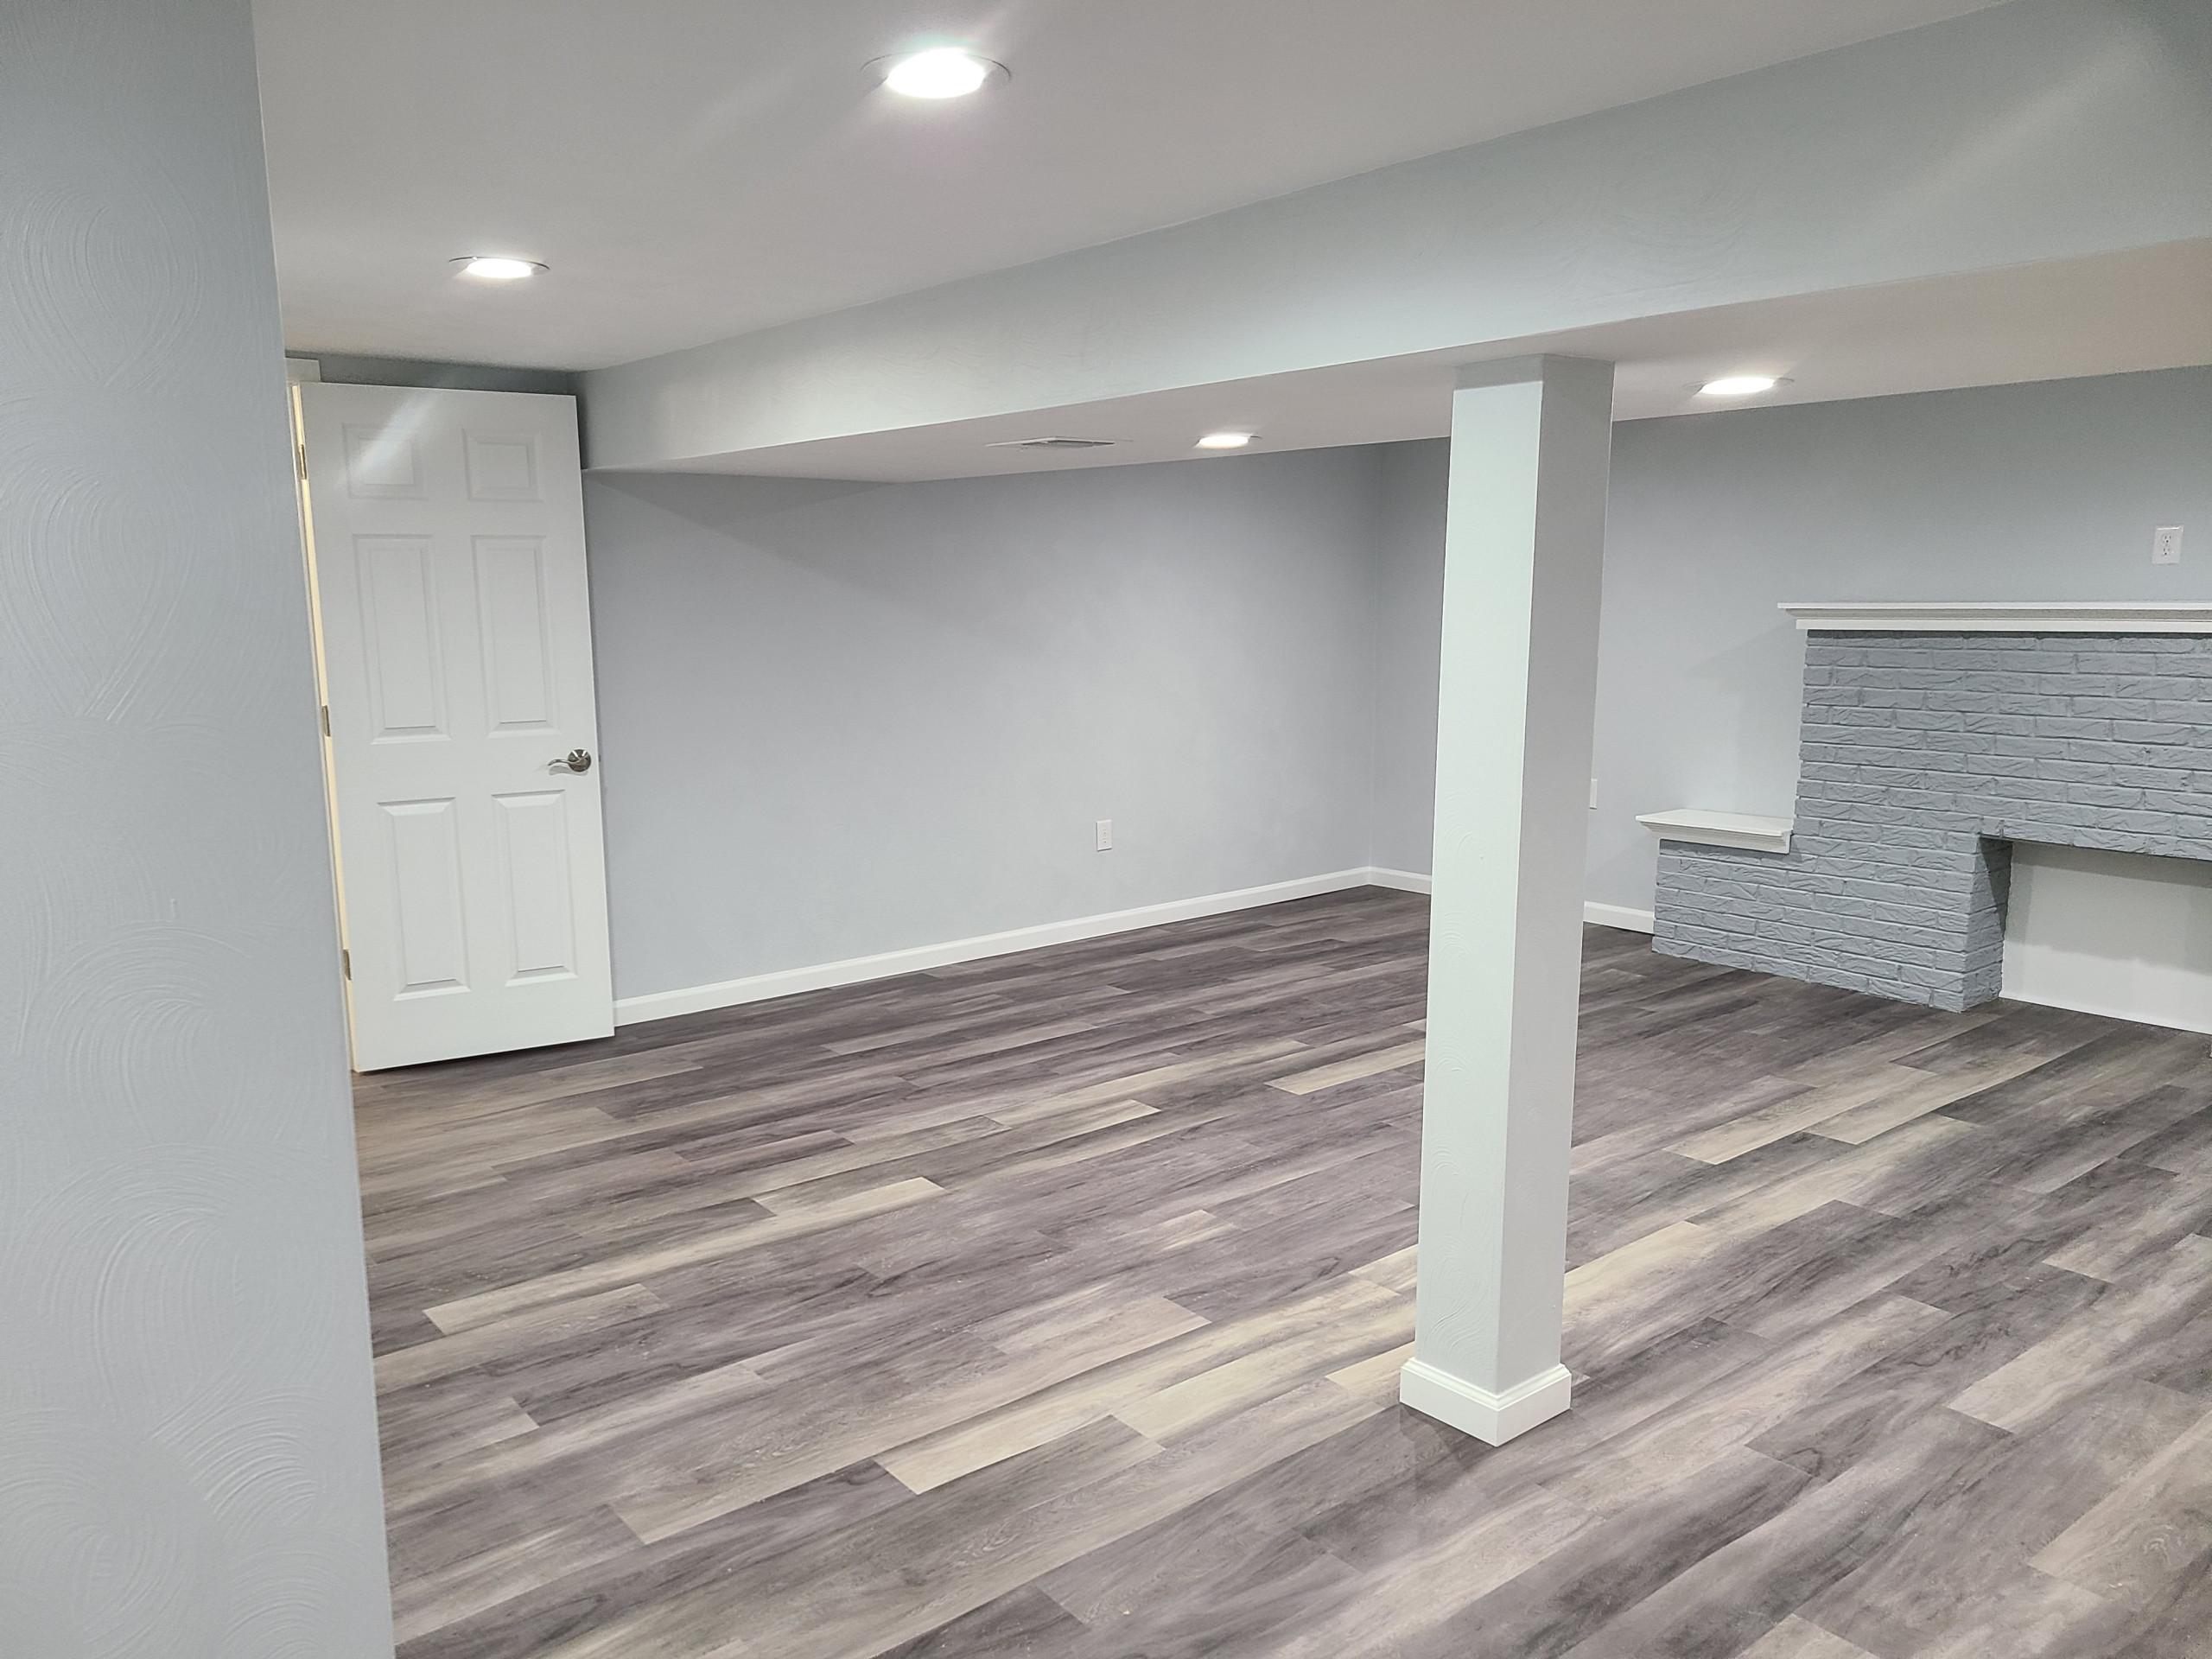 Washington basement remodel